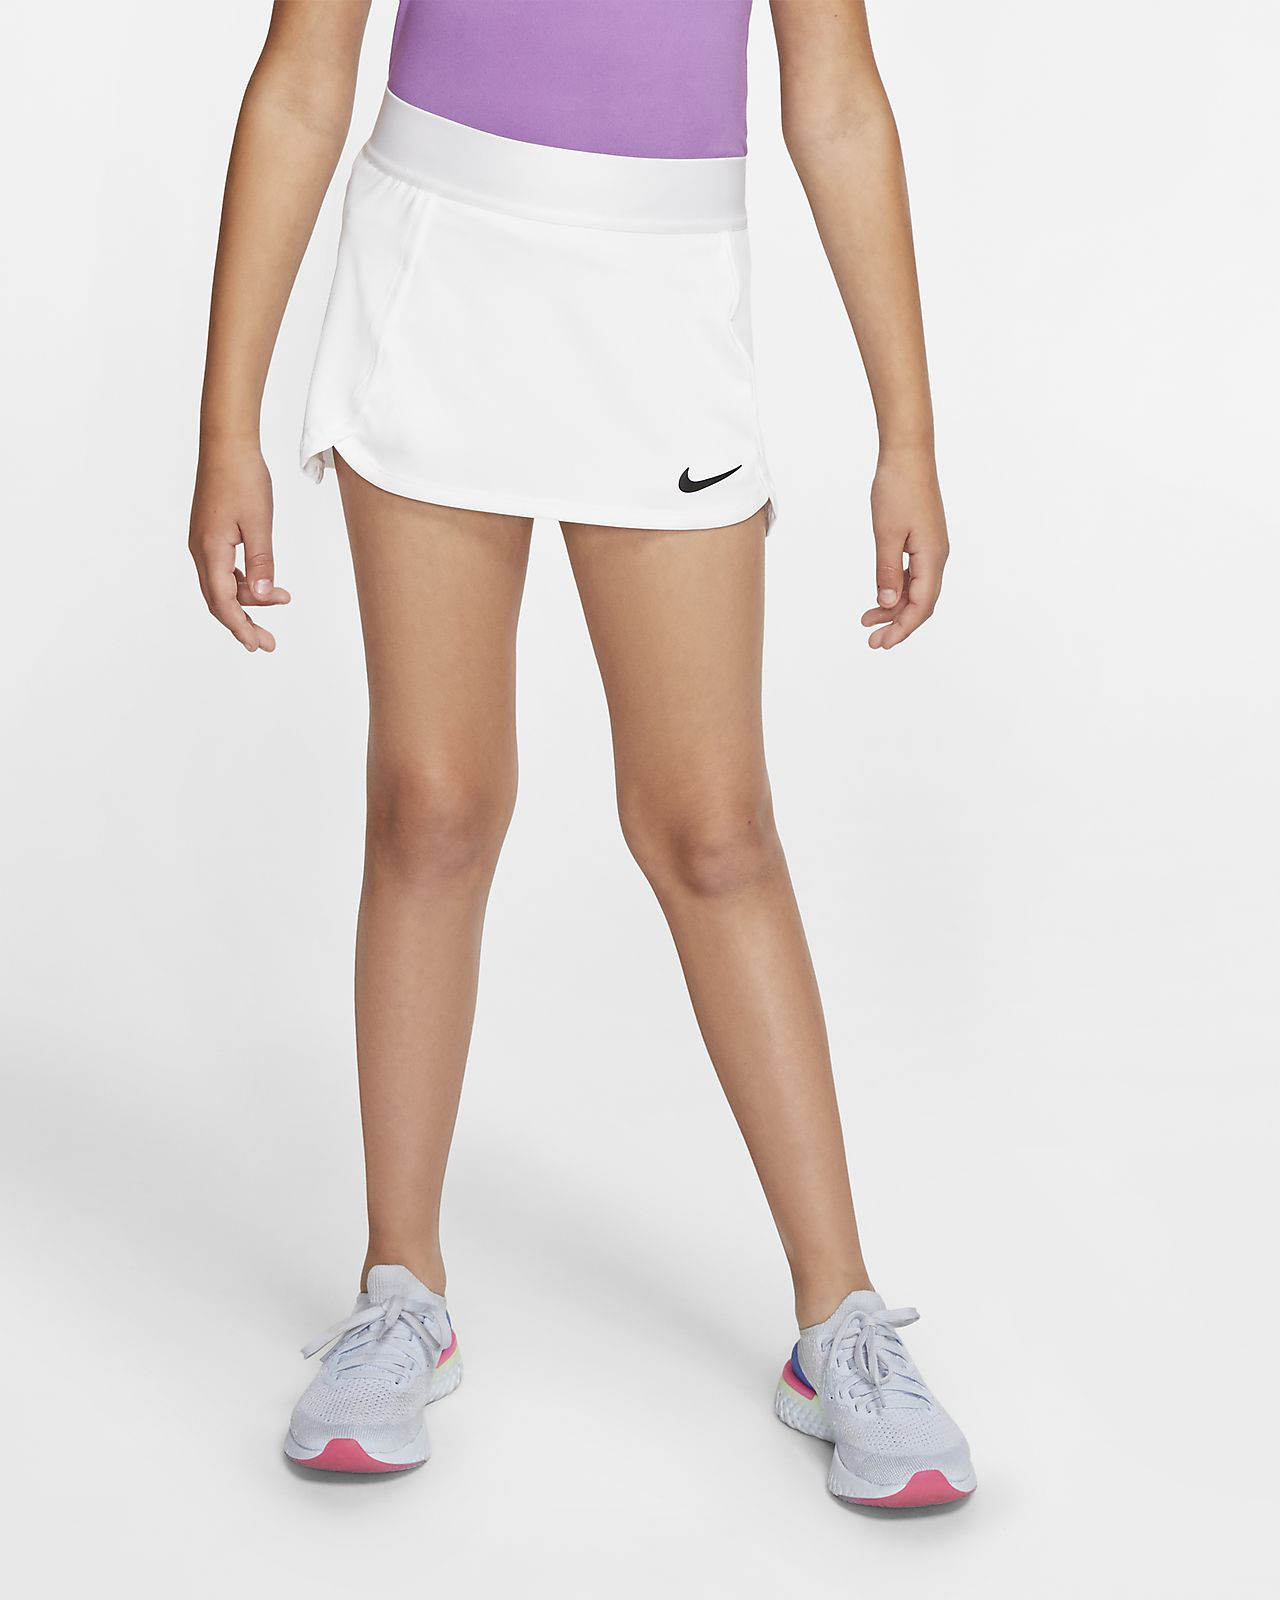 Gonna da tennis NikeCourt - Ragazza